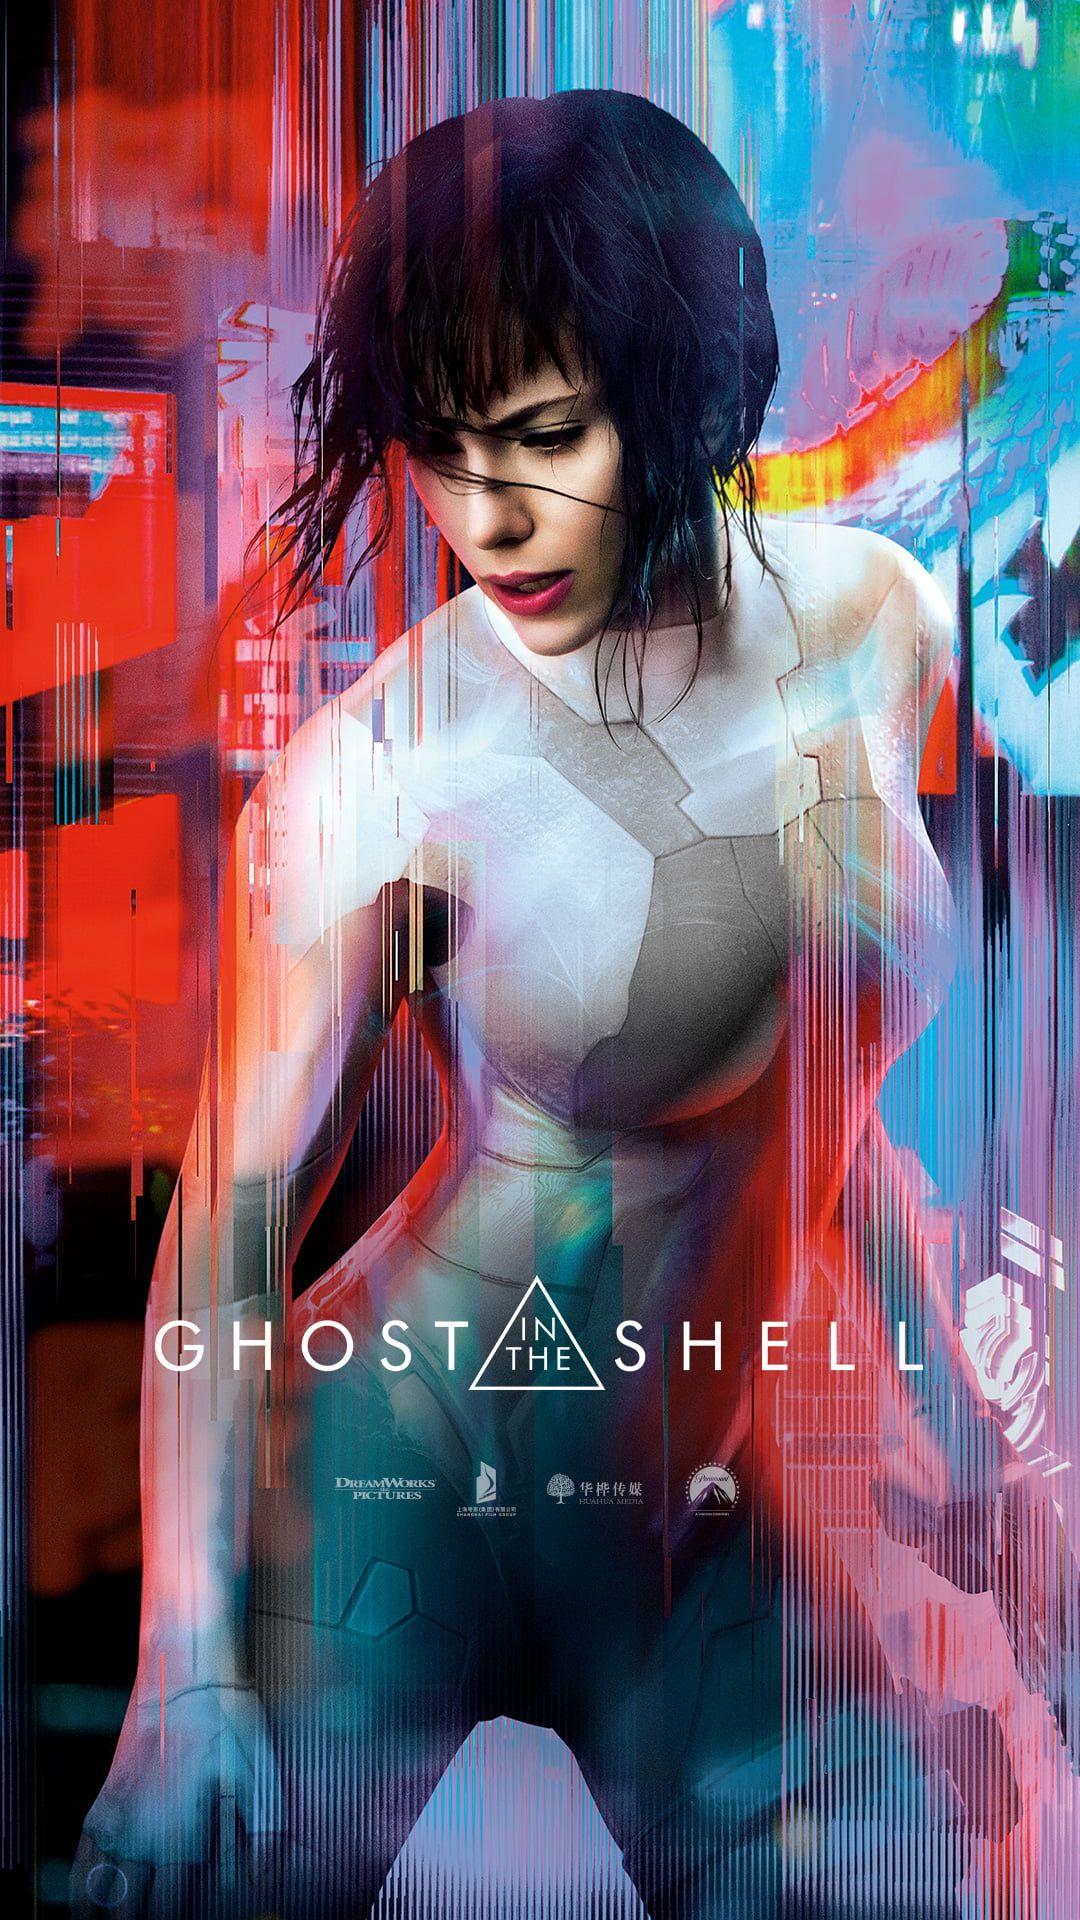 Ghost In The Shell Wallpaper Scarlett Johansson Movies Kusanagi